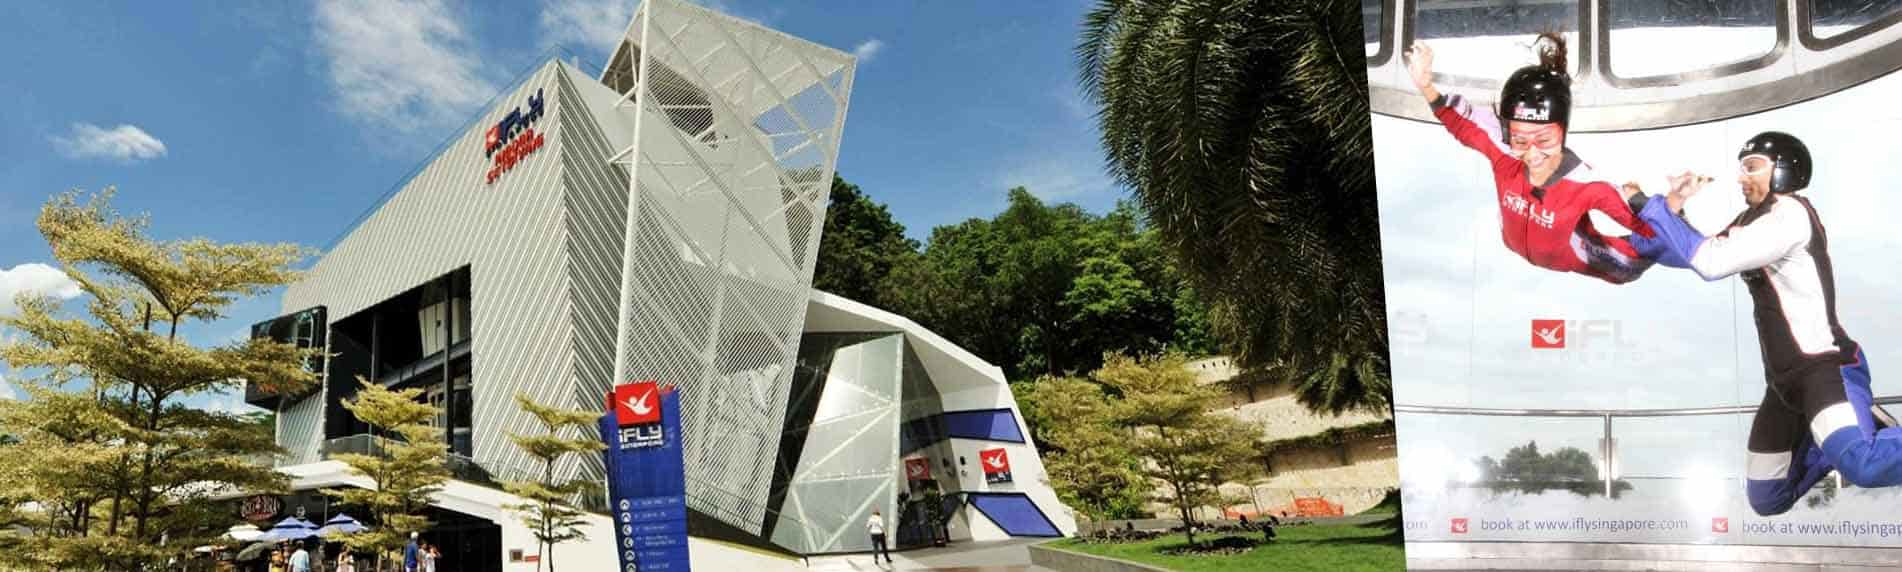 ifly singapore activity